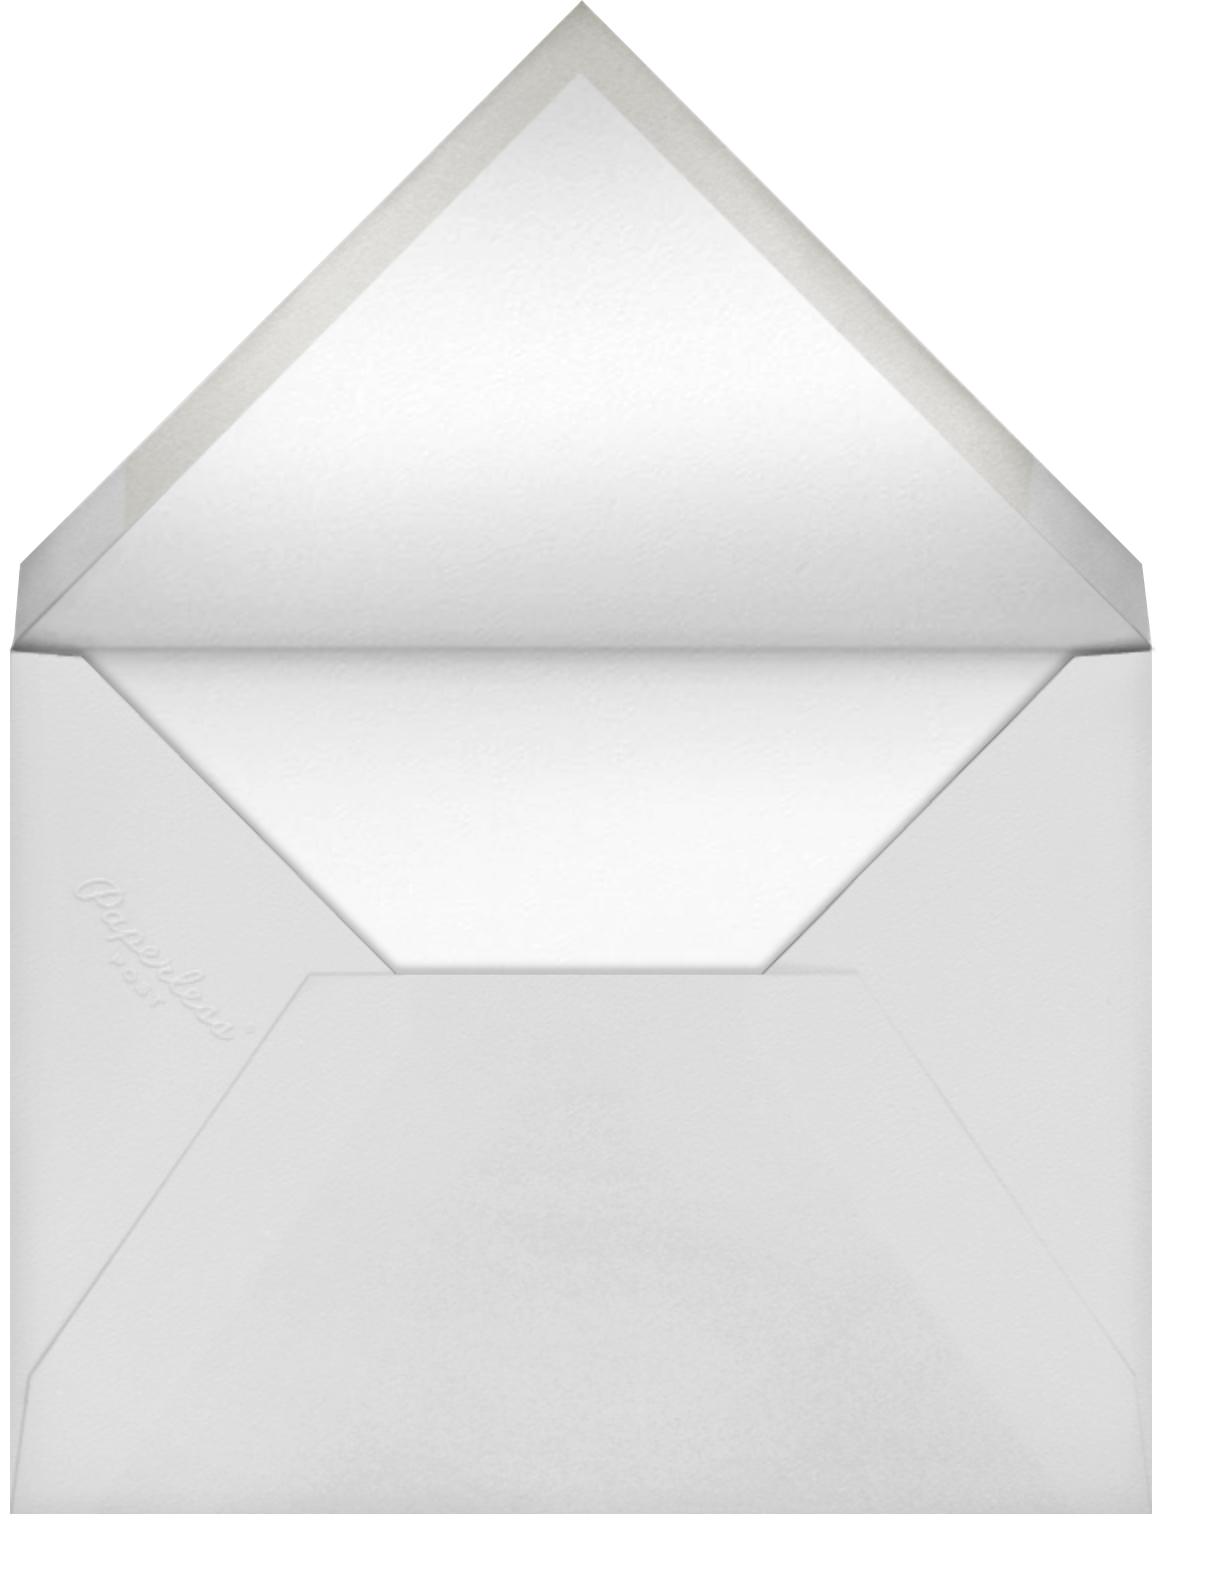 Stella And Dot Diagonal - Orange - Paperless Post - null - envelope back